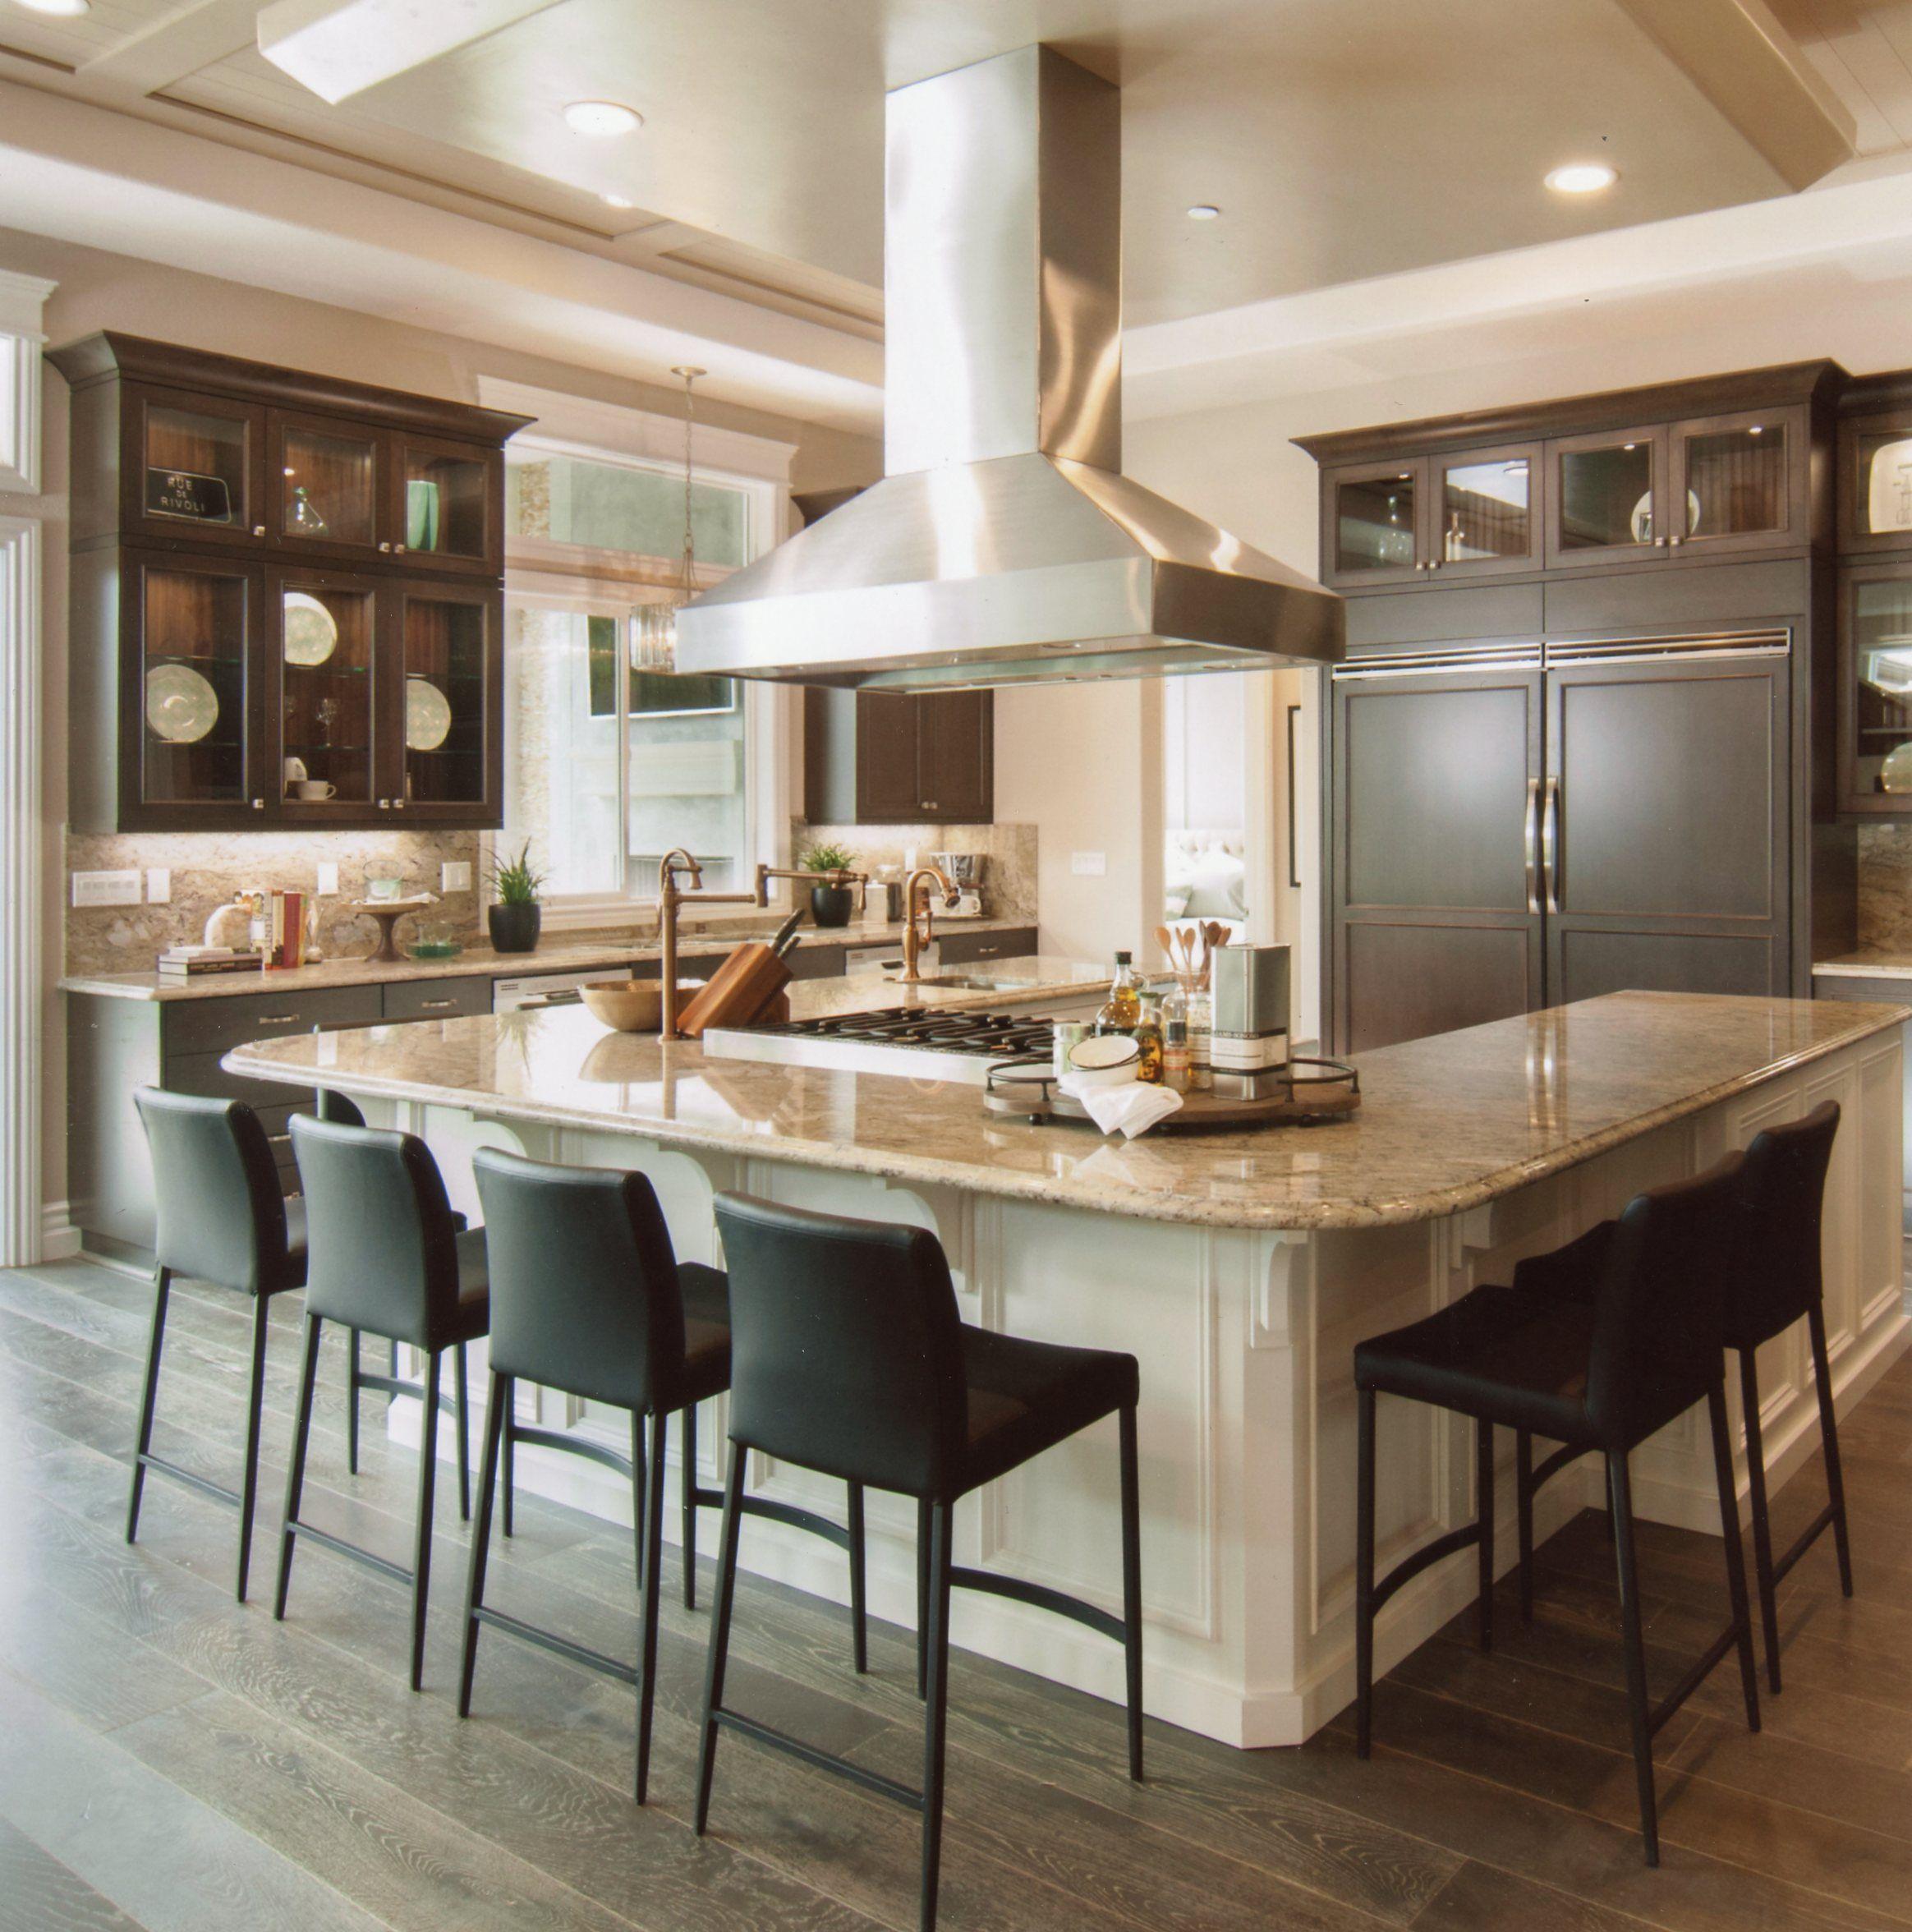 Kit-Maple Kitchen | Maple kitchen, Cabinets for sale ...